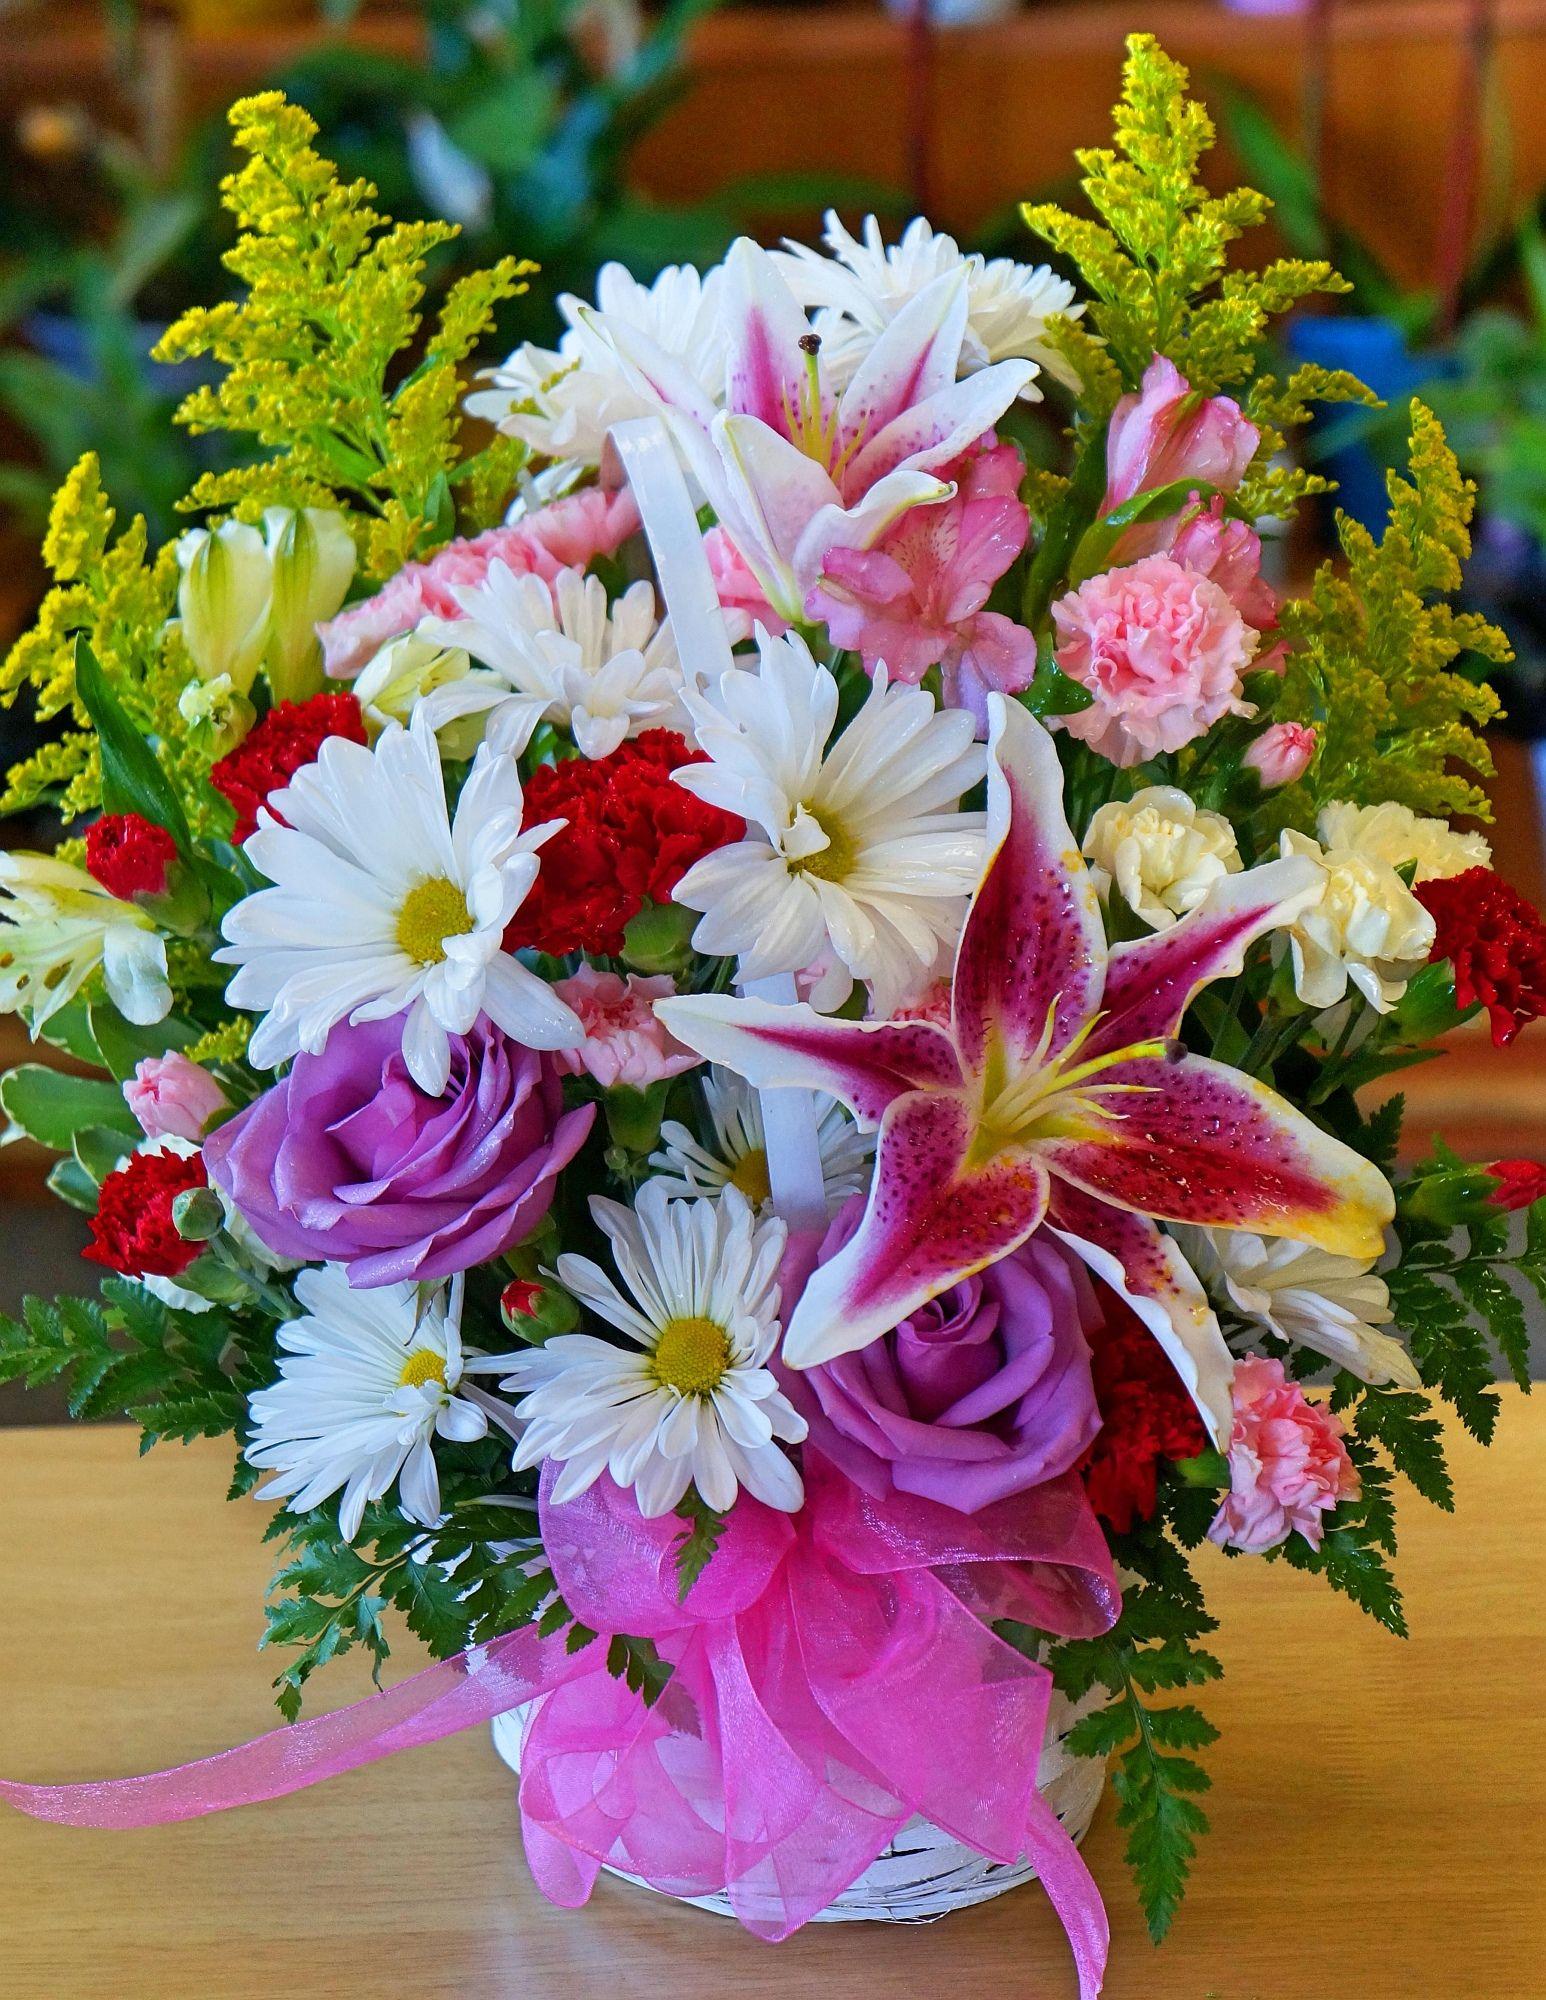 12 flower bouquets 12 virágcsokor Virágok